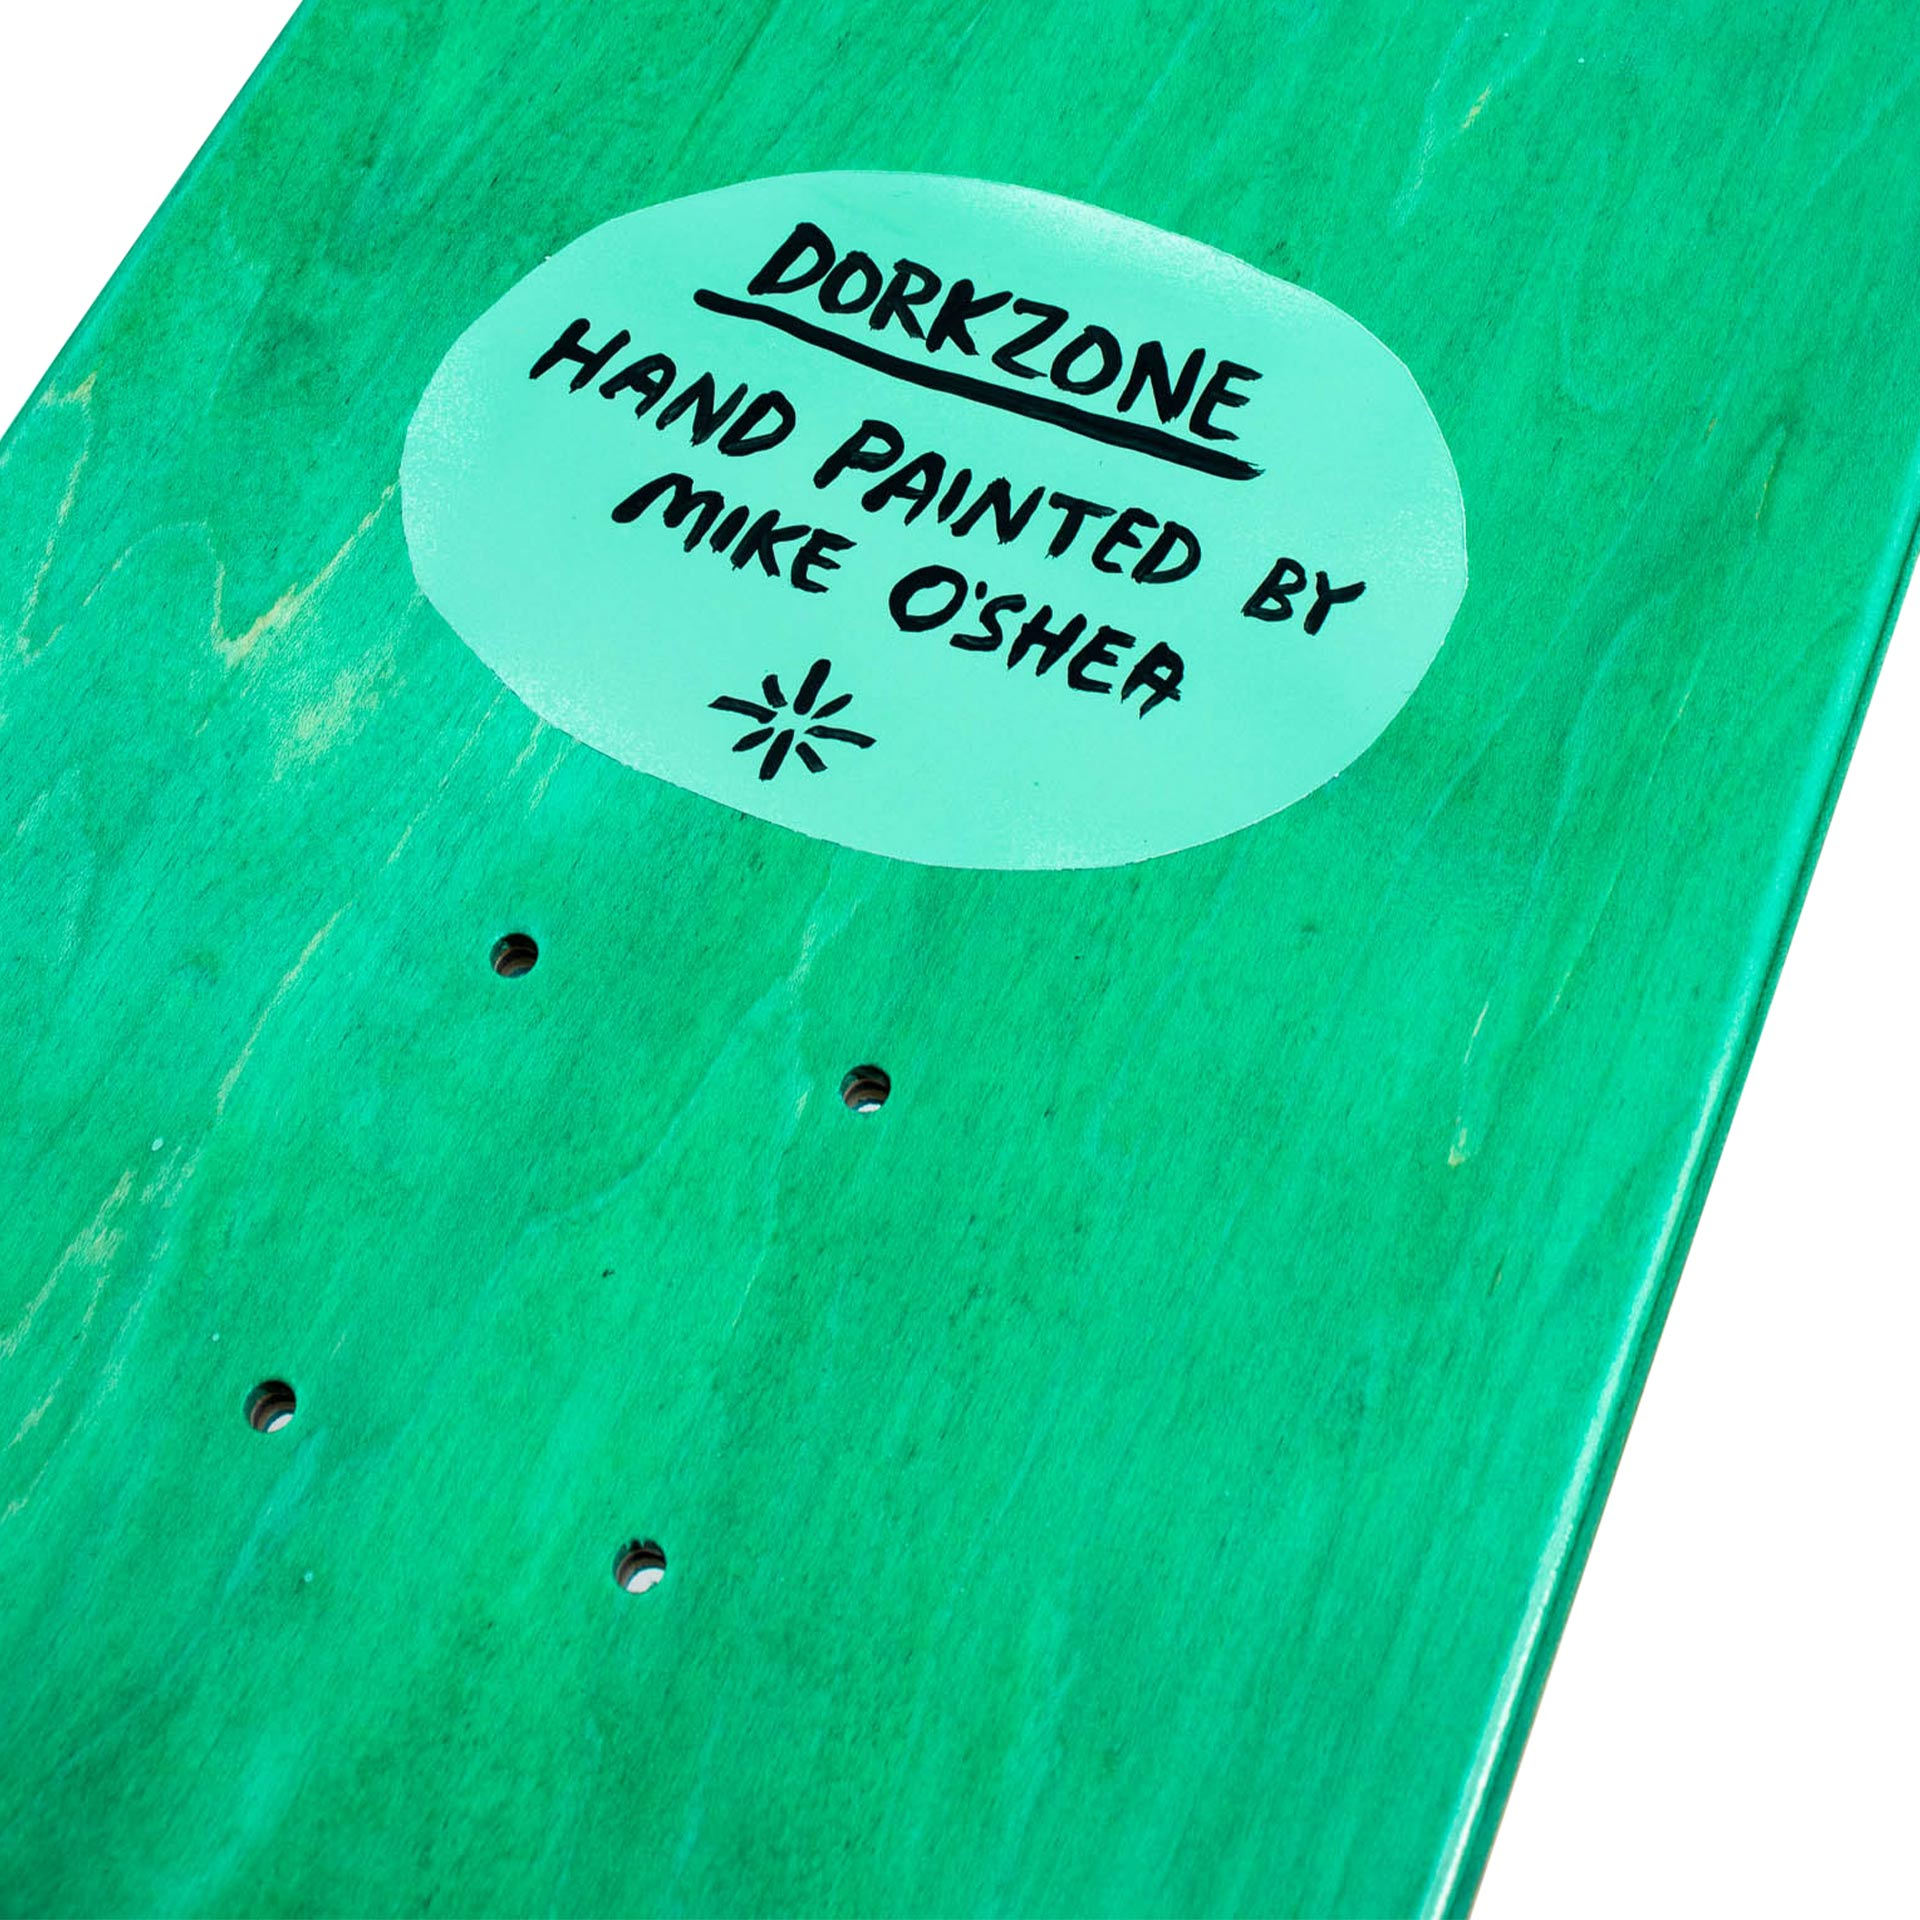 Dorkzone Hand Painted Skateboard